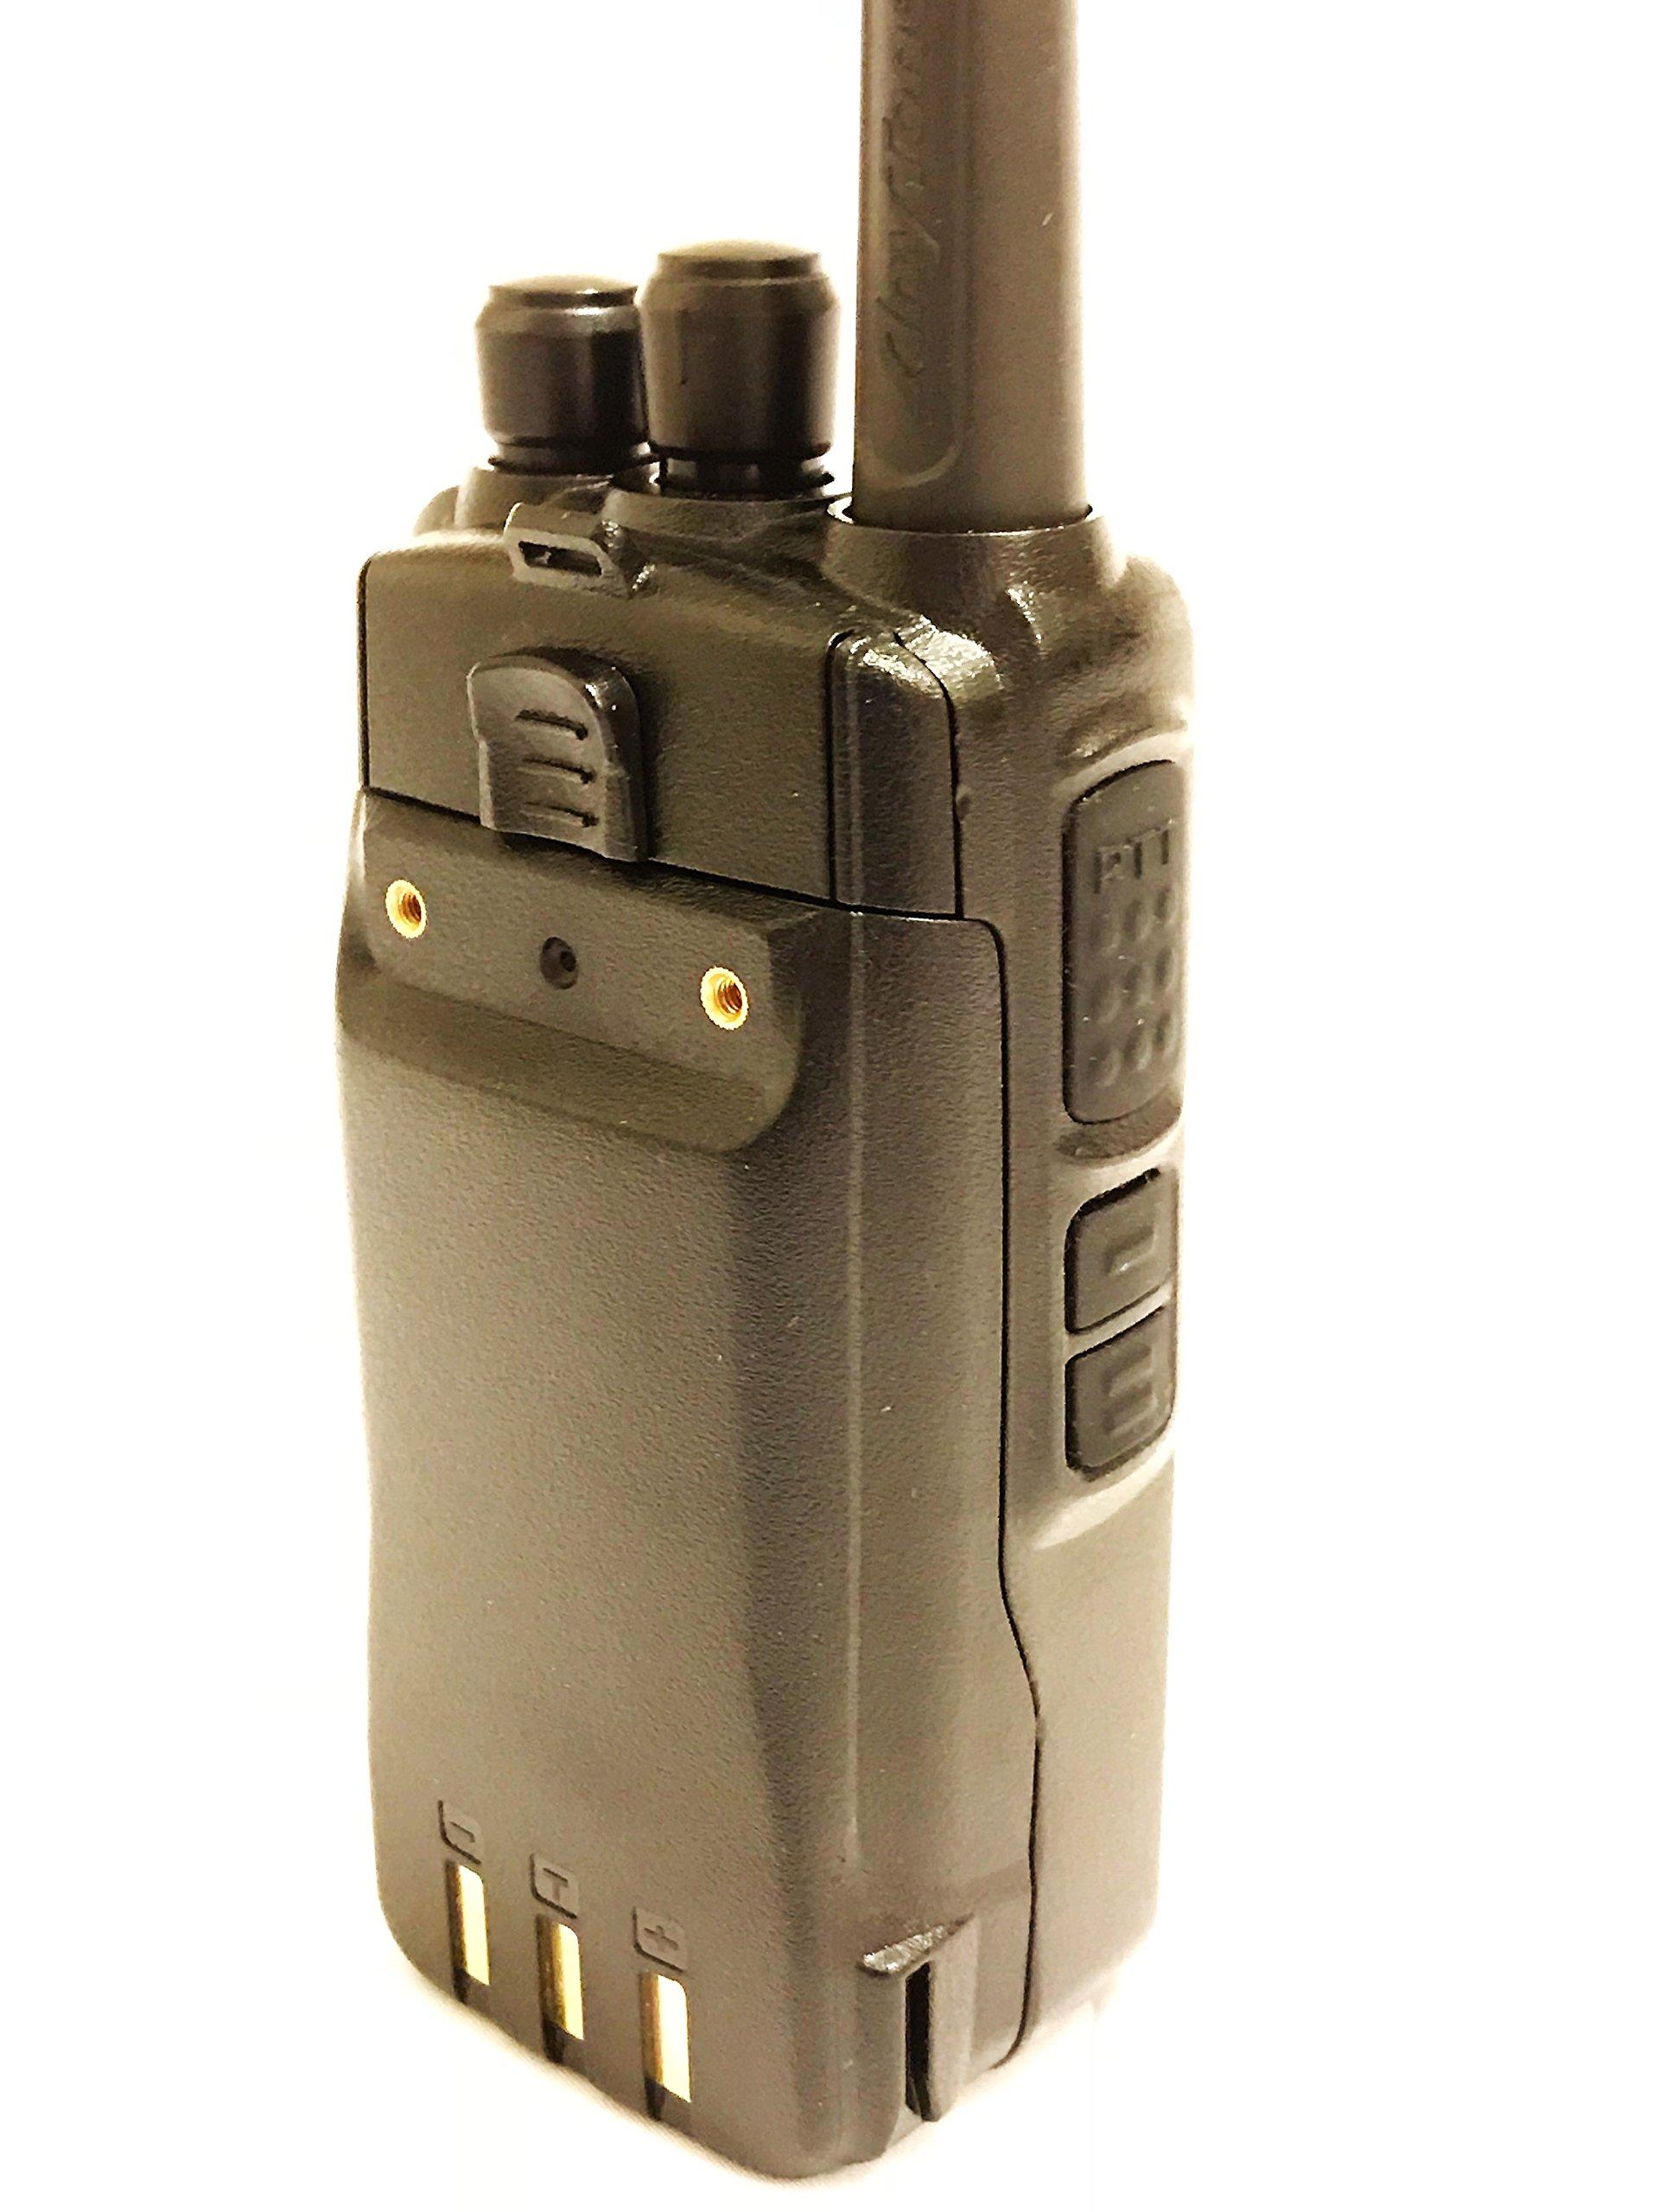 AnyTone AT-D868UV GPS Version II Upgraded 3100mAh battery Dual Band DMR/Analog 144 & 430 MHz Radio US Seller by AnyTone (Image #3)